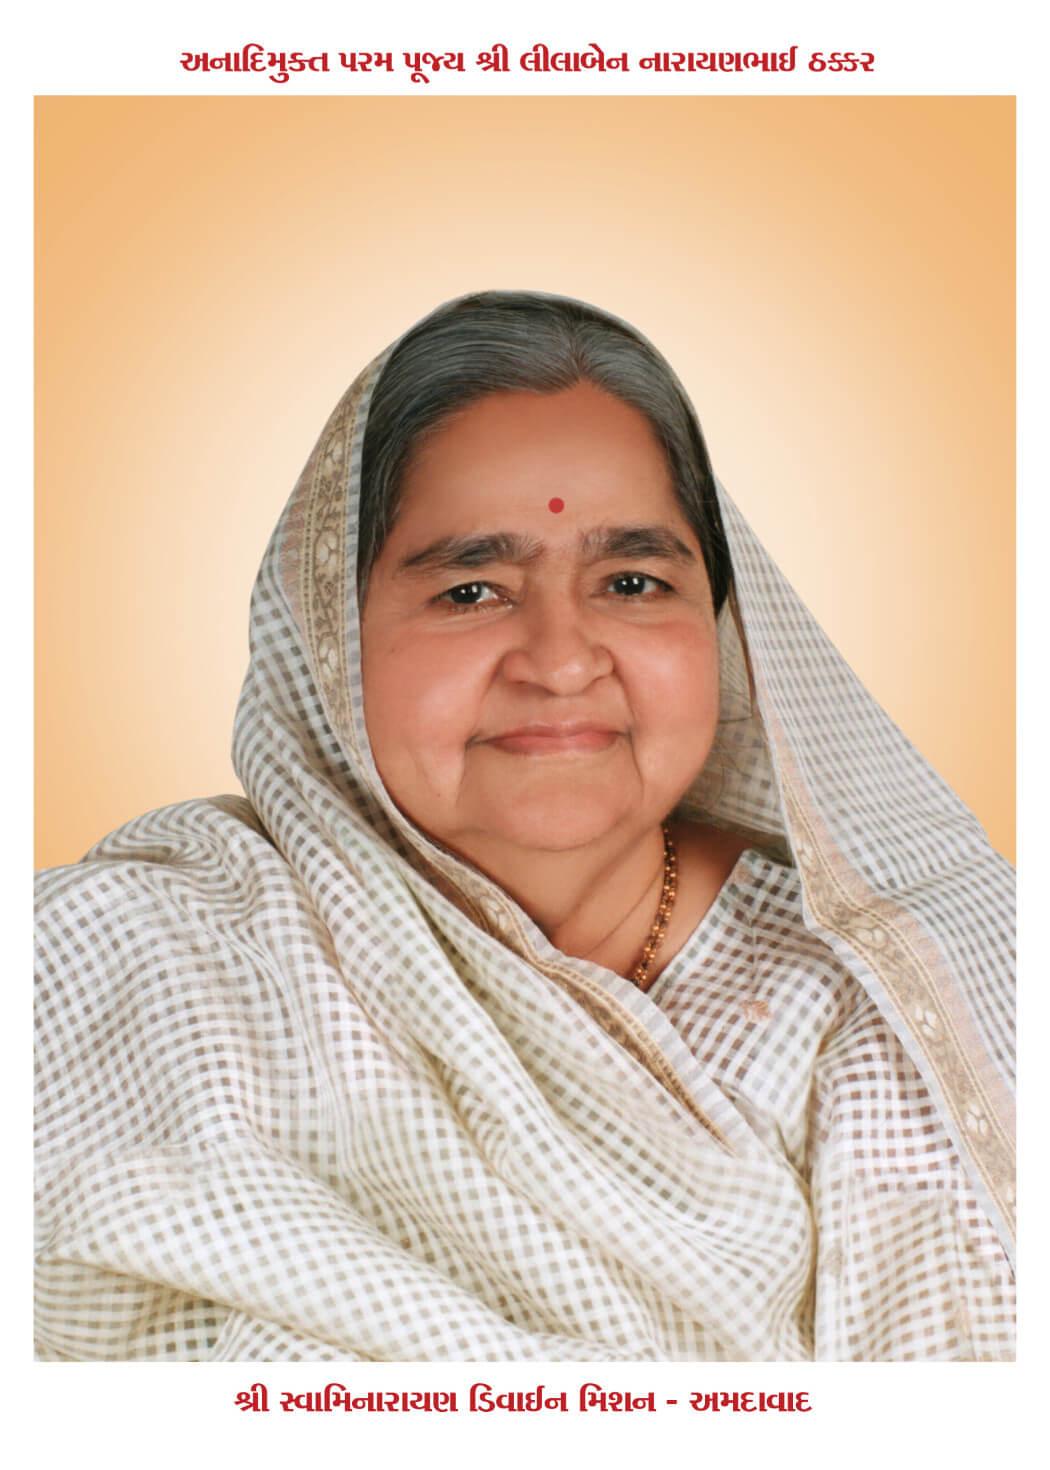 Pujya Leelamasi Pragtyadin Satsang Brahmyagna Dt 05/02/2019